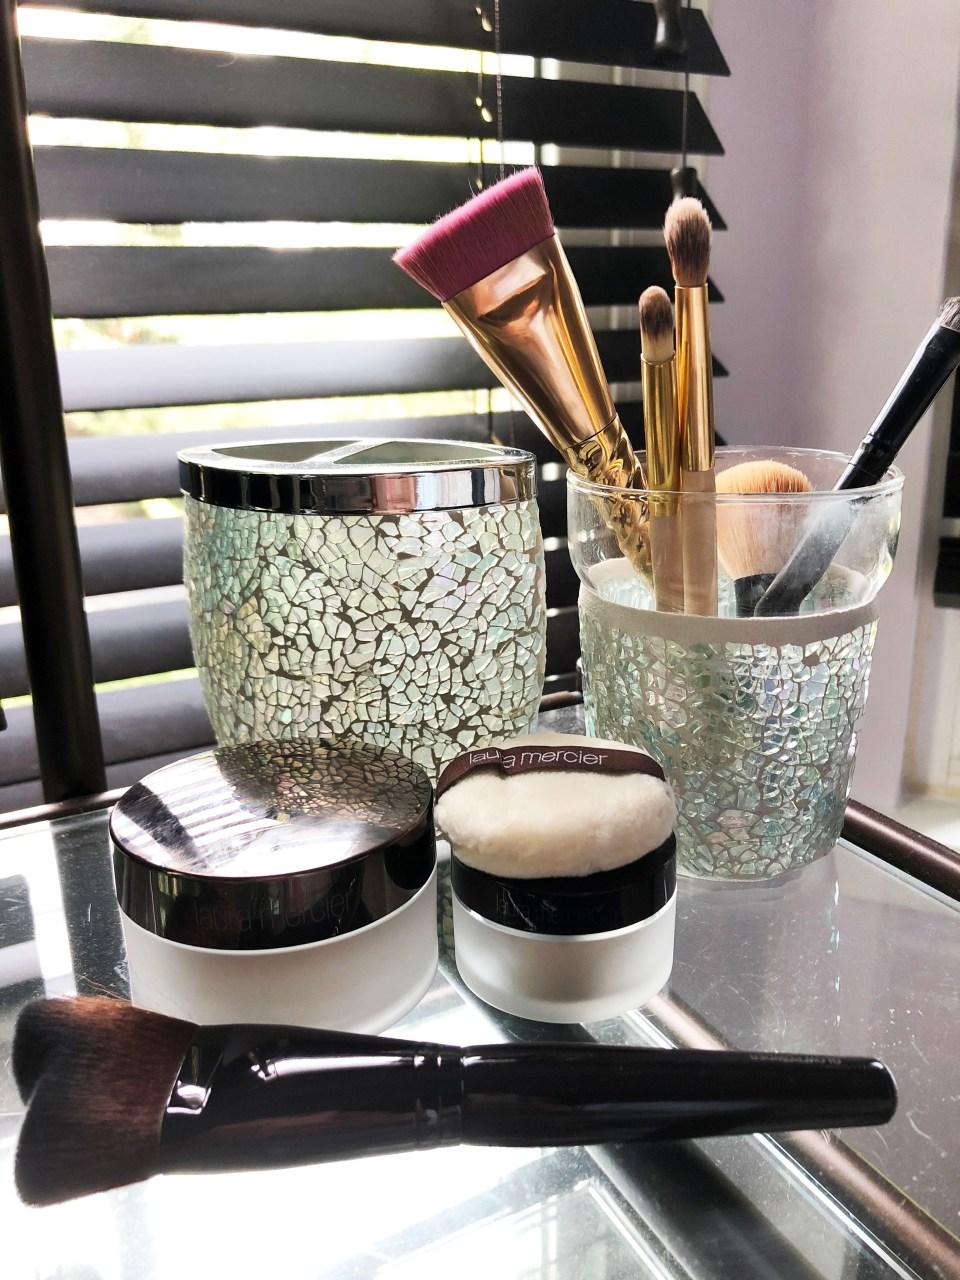 Laura Mercier Translucent Powder + brush 1